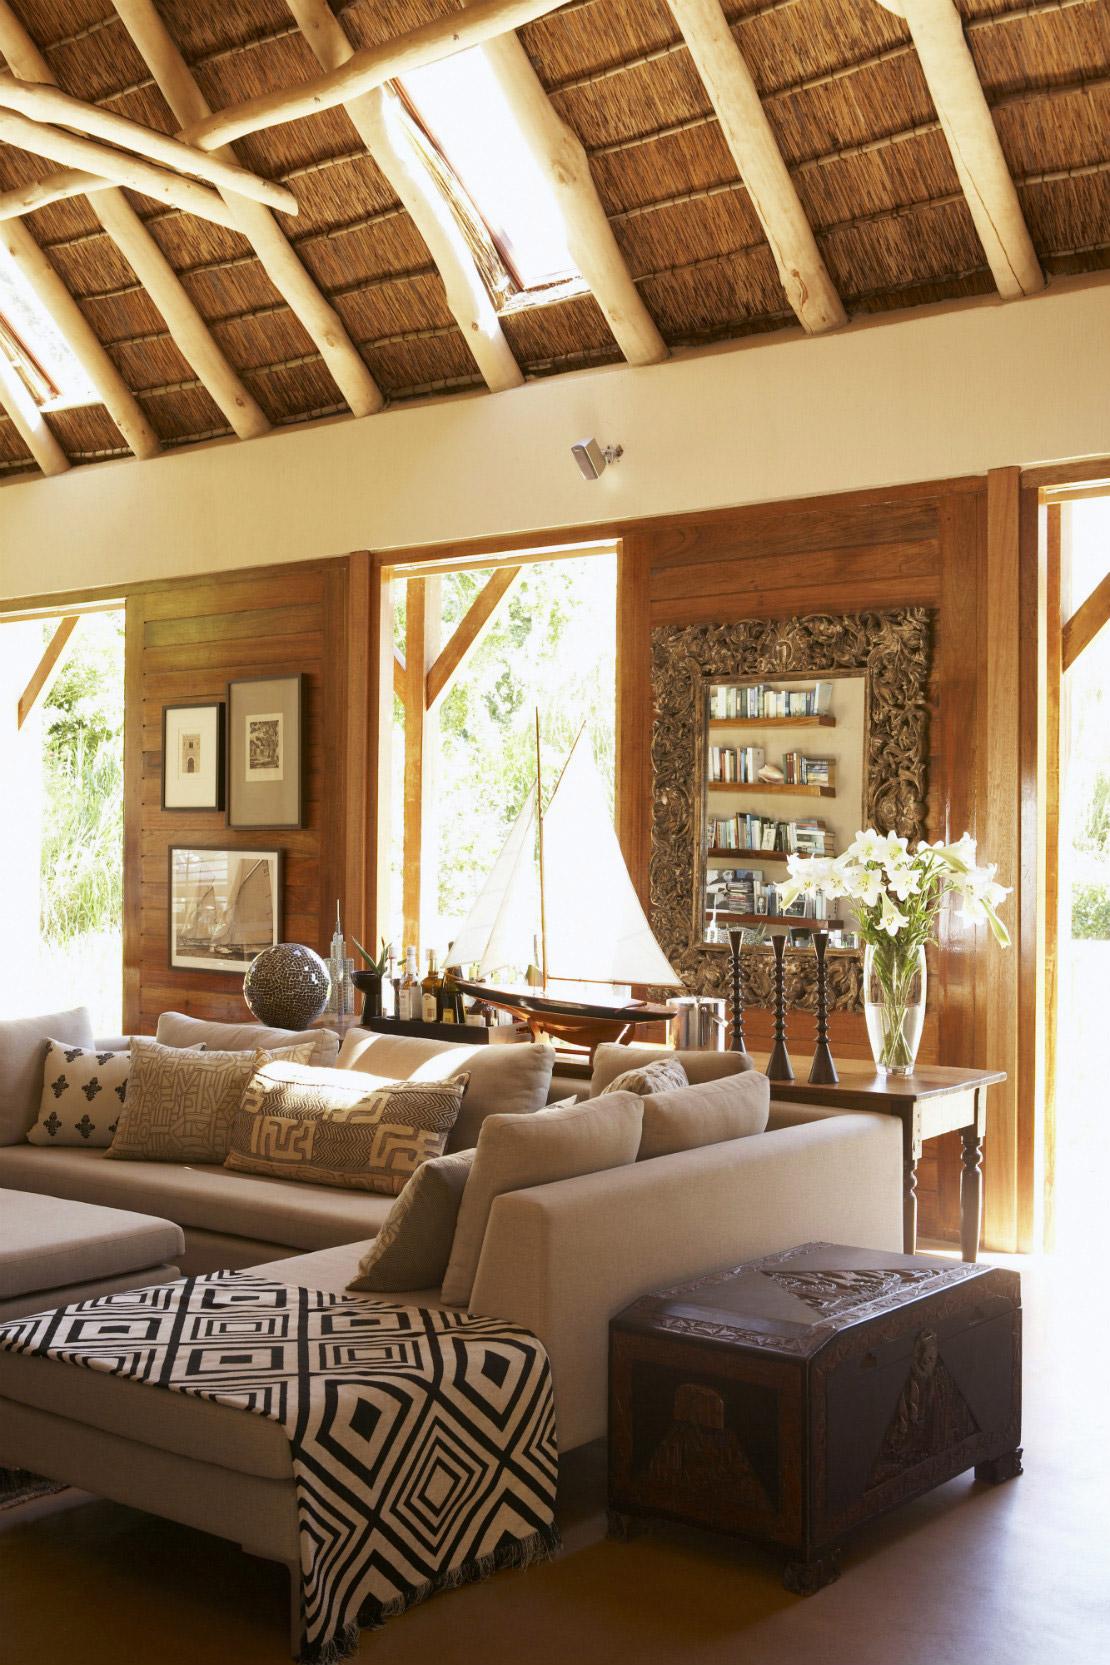 Casa in stile safari arredi etnici westwing magazine for Arredamento casa stile africano